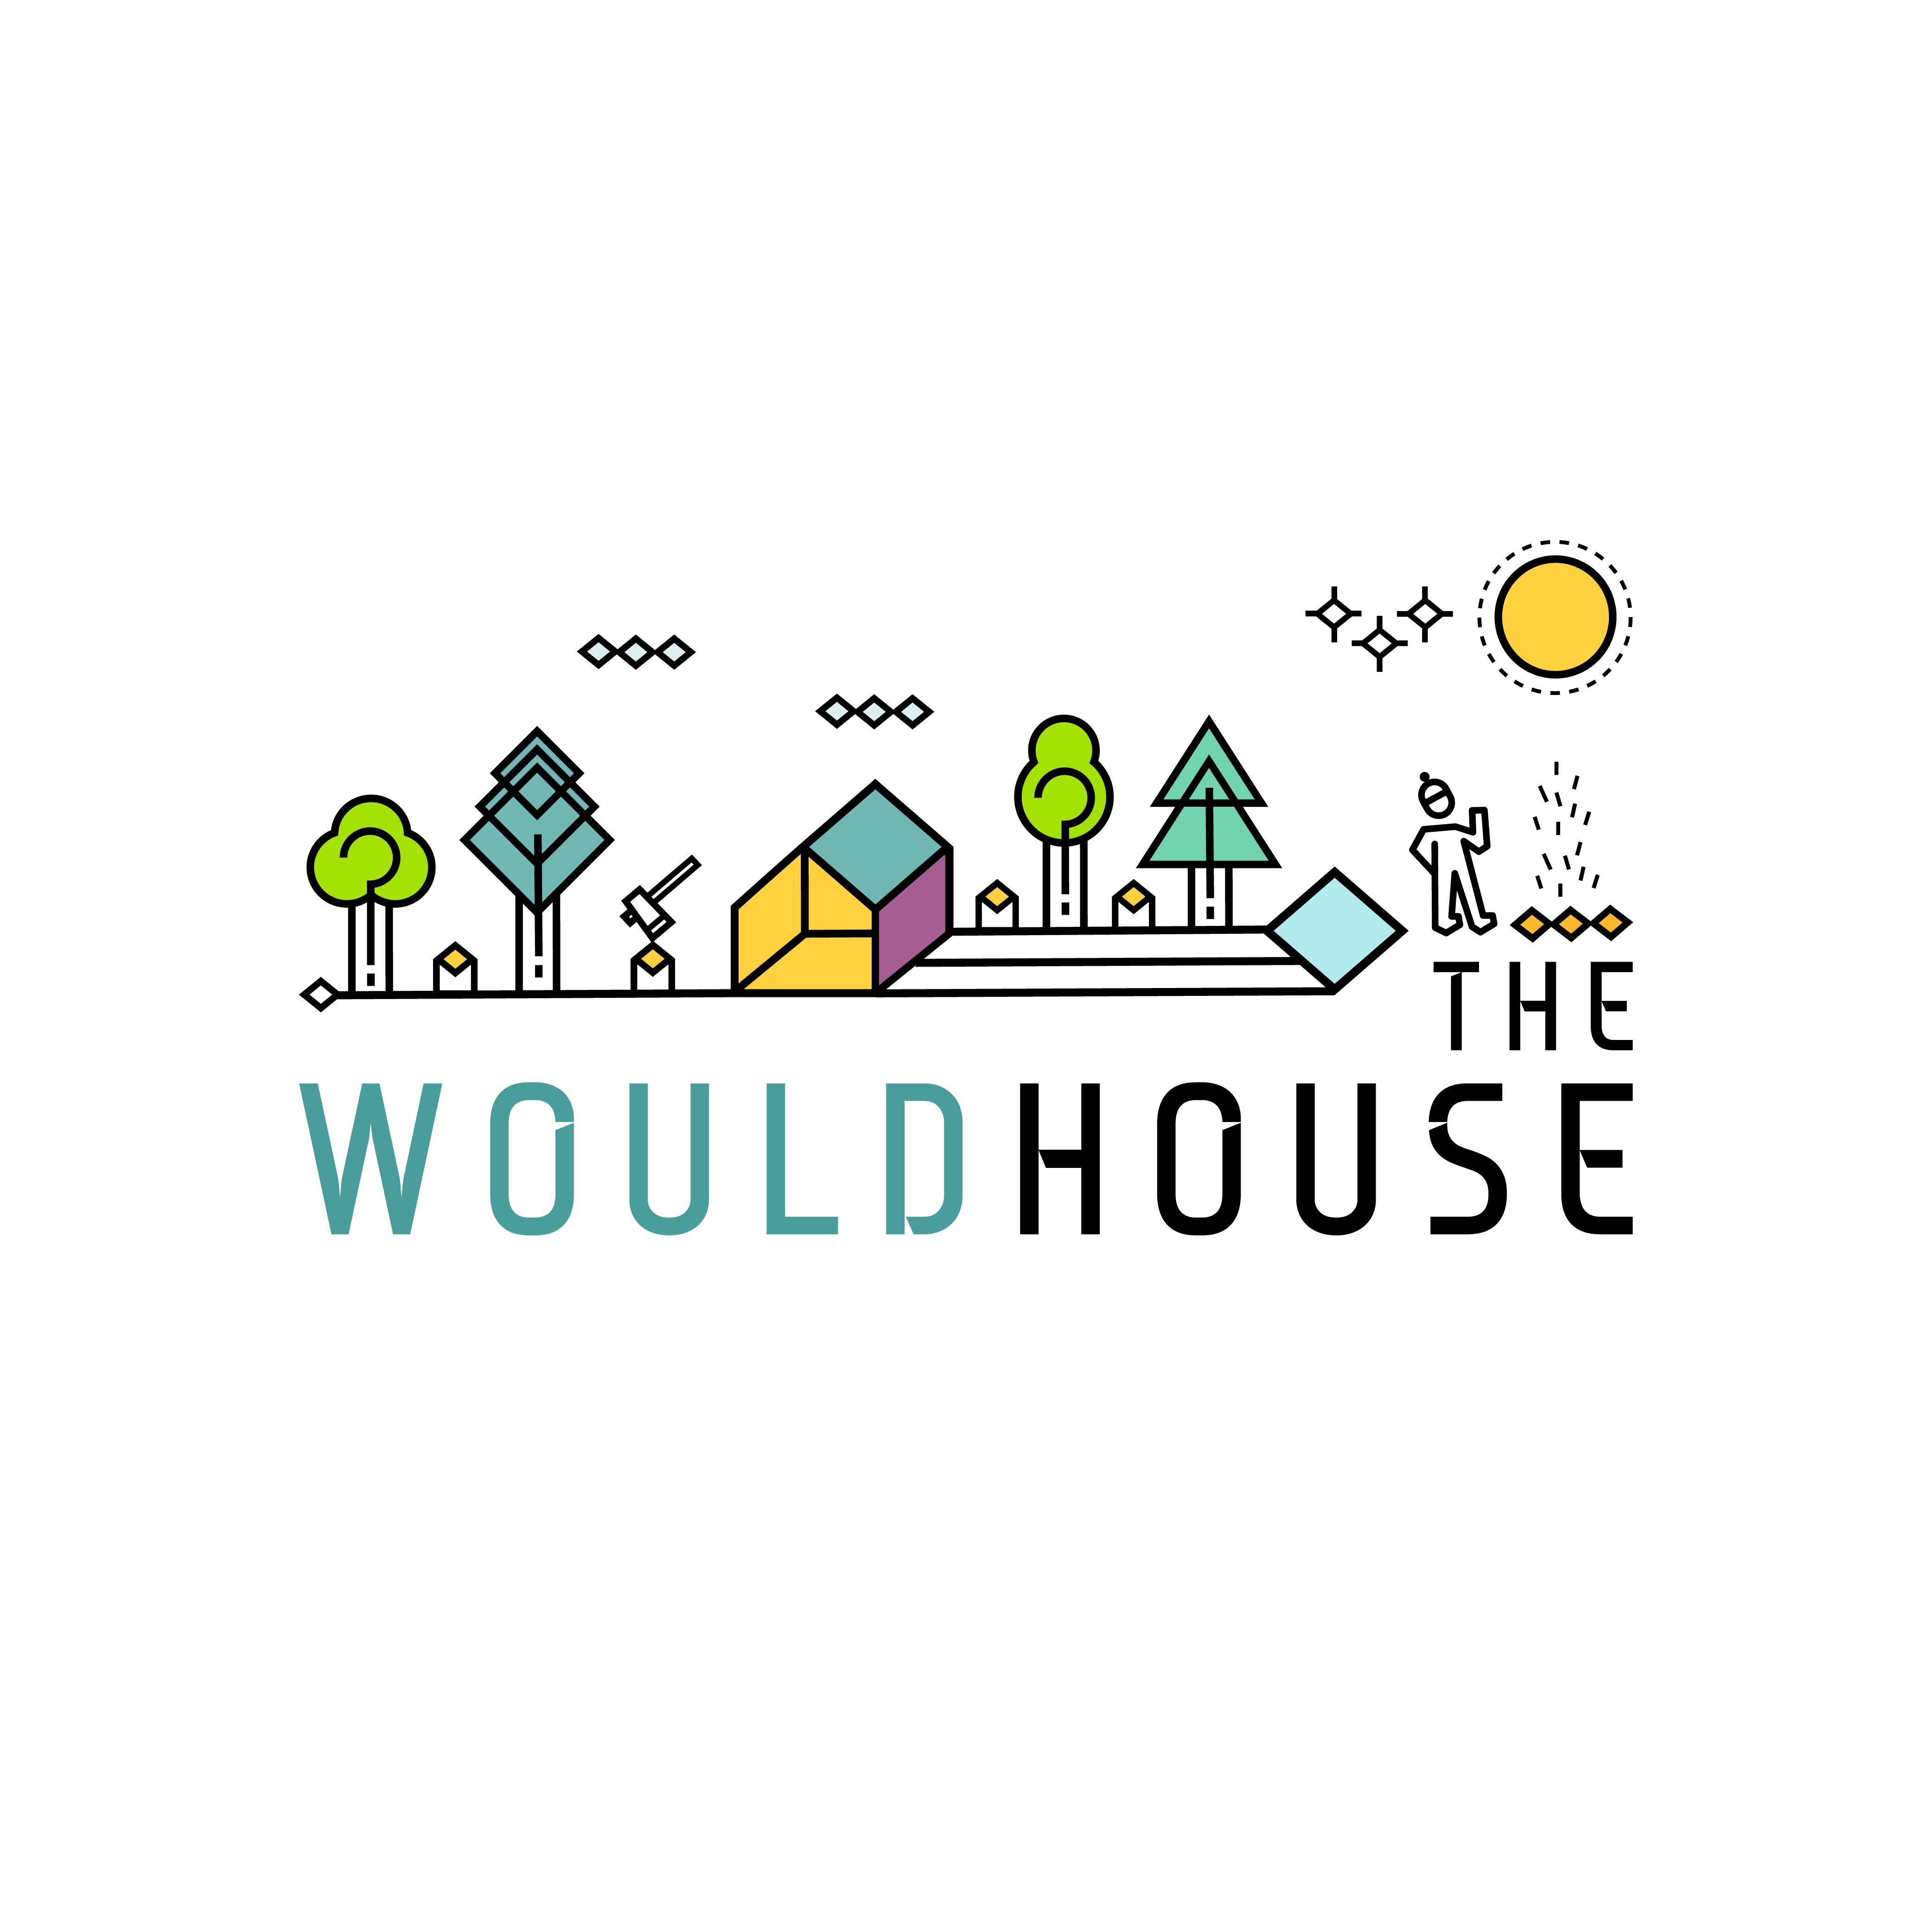 Campervan creative think-tank design for Wouldhouse.com